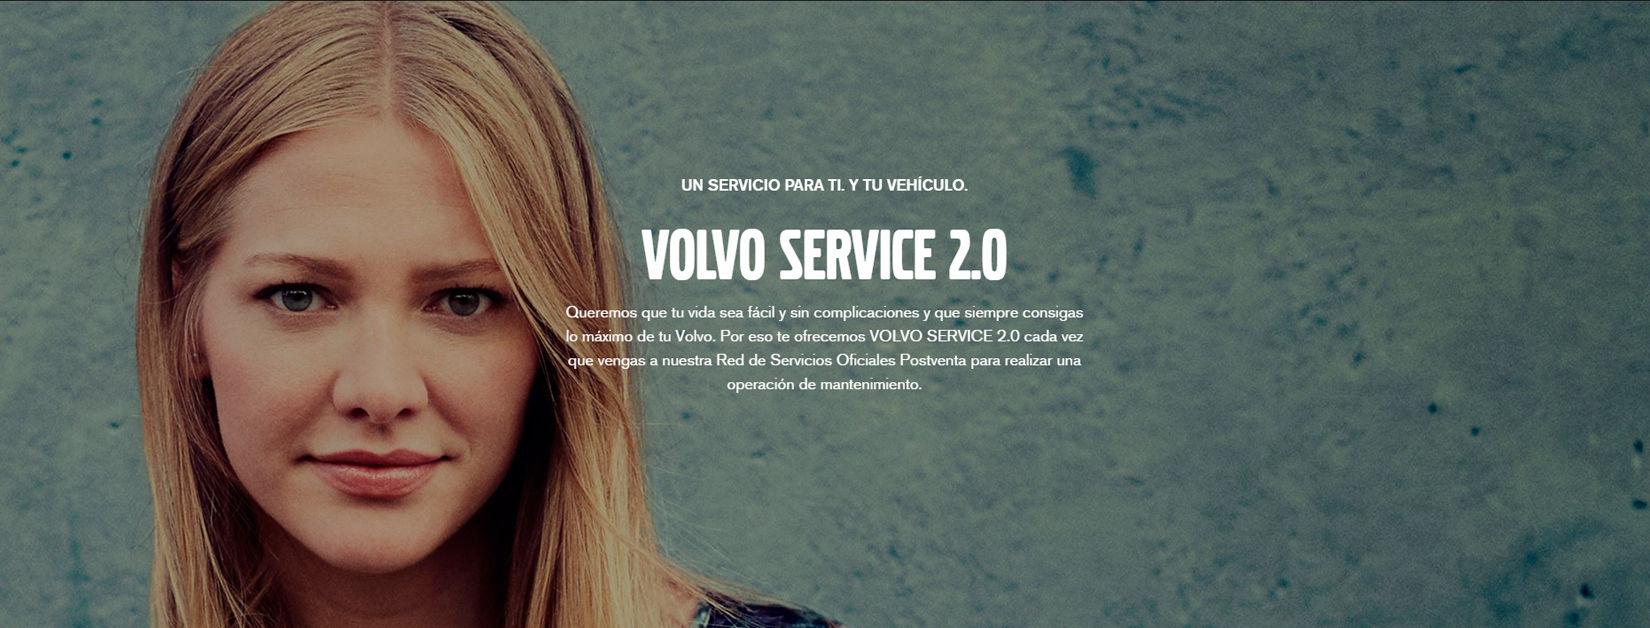 Oferta Volvo Service 2.0